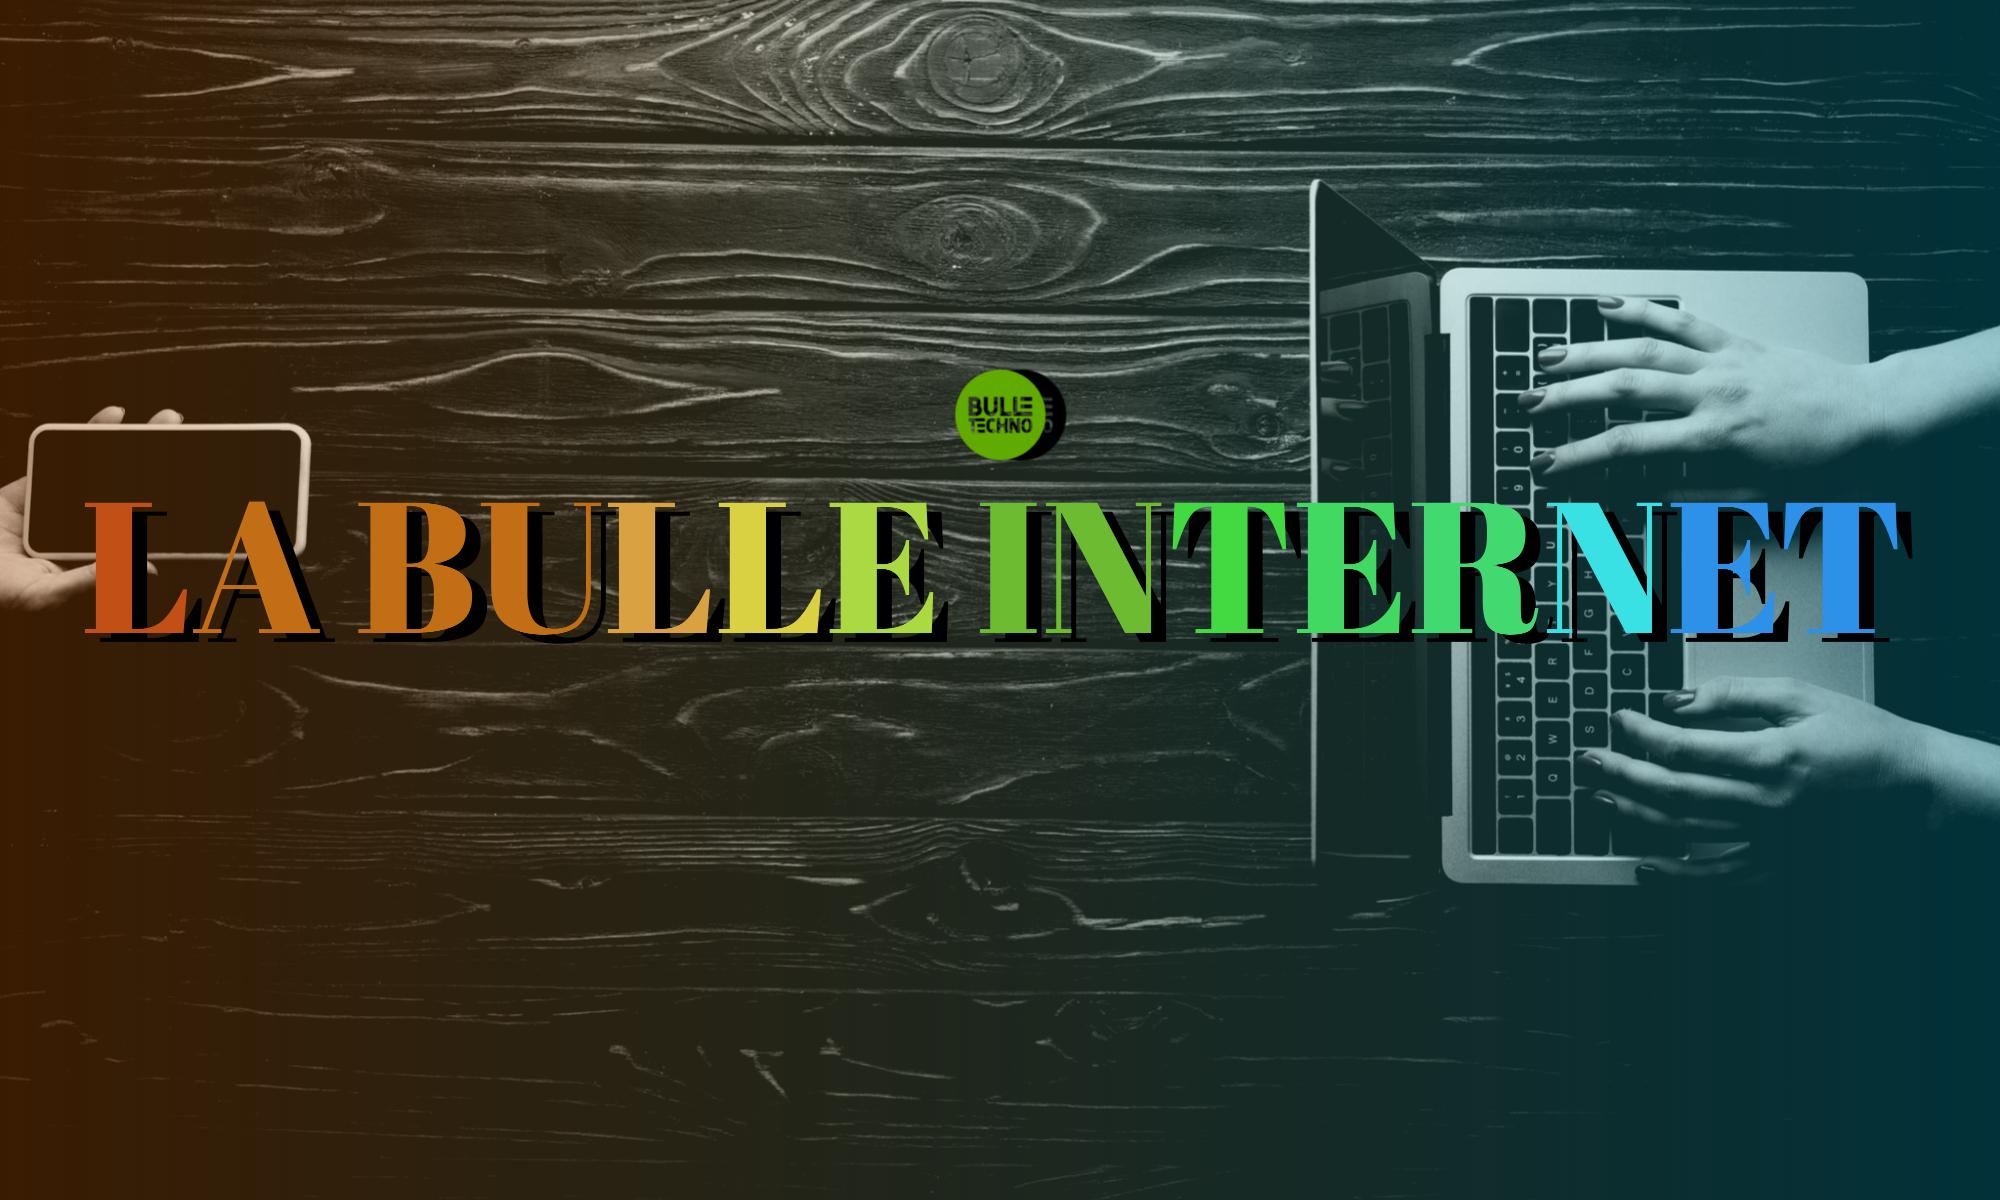 la bulle internet